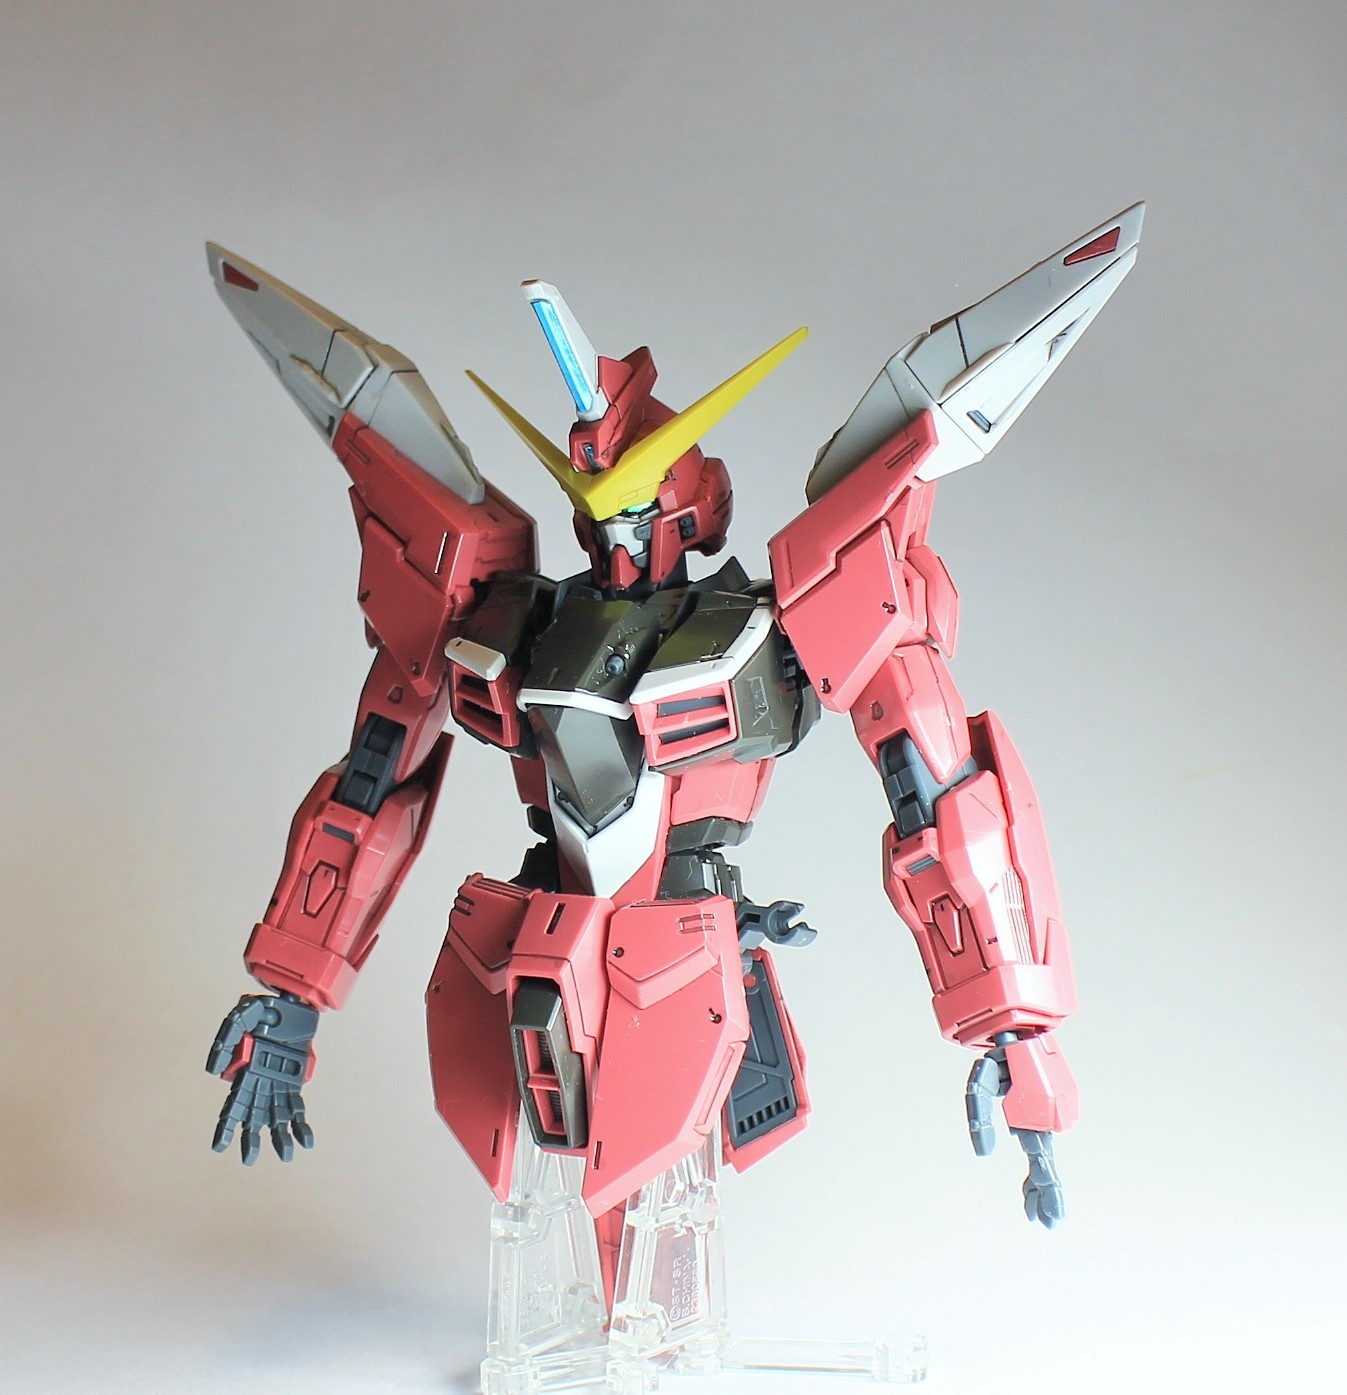 MG-Justice-000.jpg